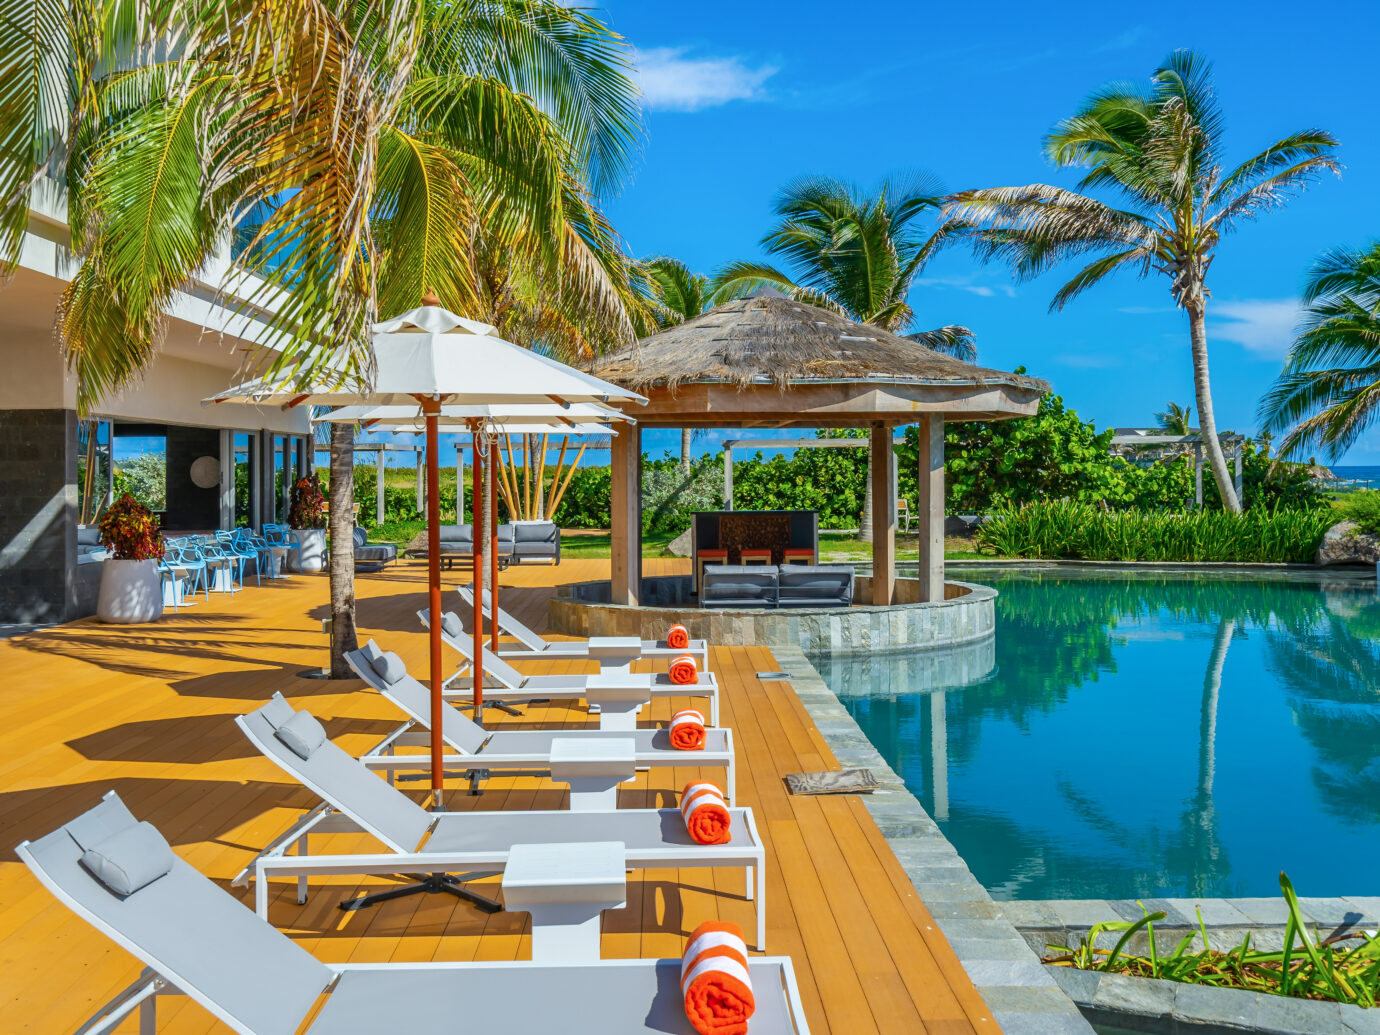 Pool at Koi Resort St Kitts